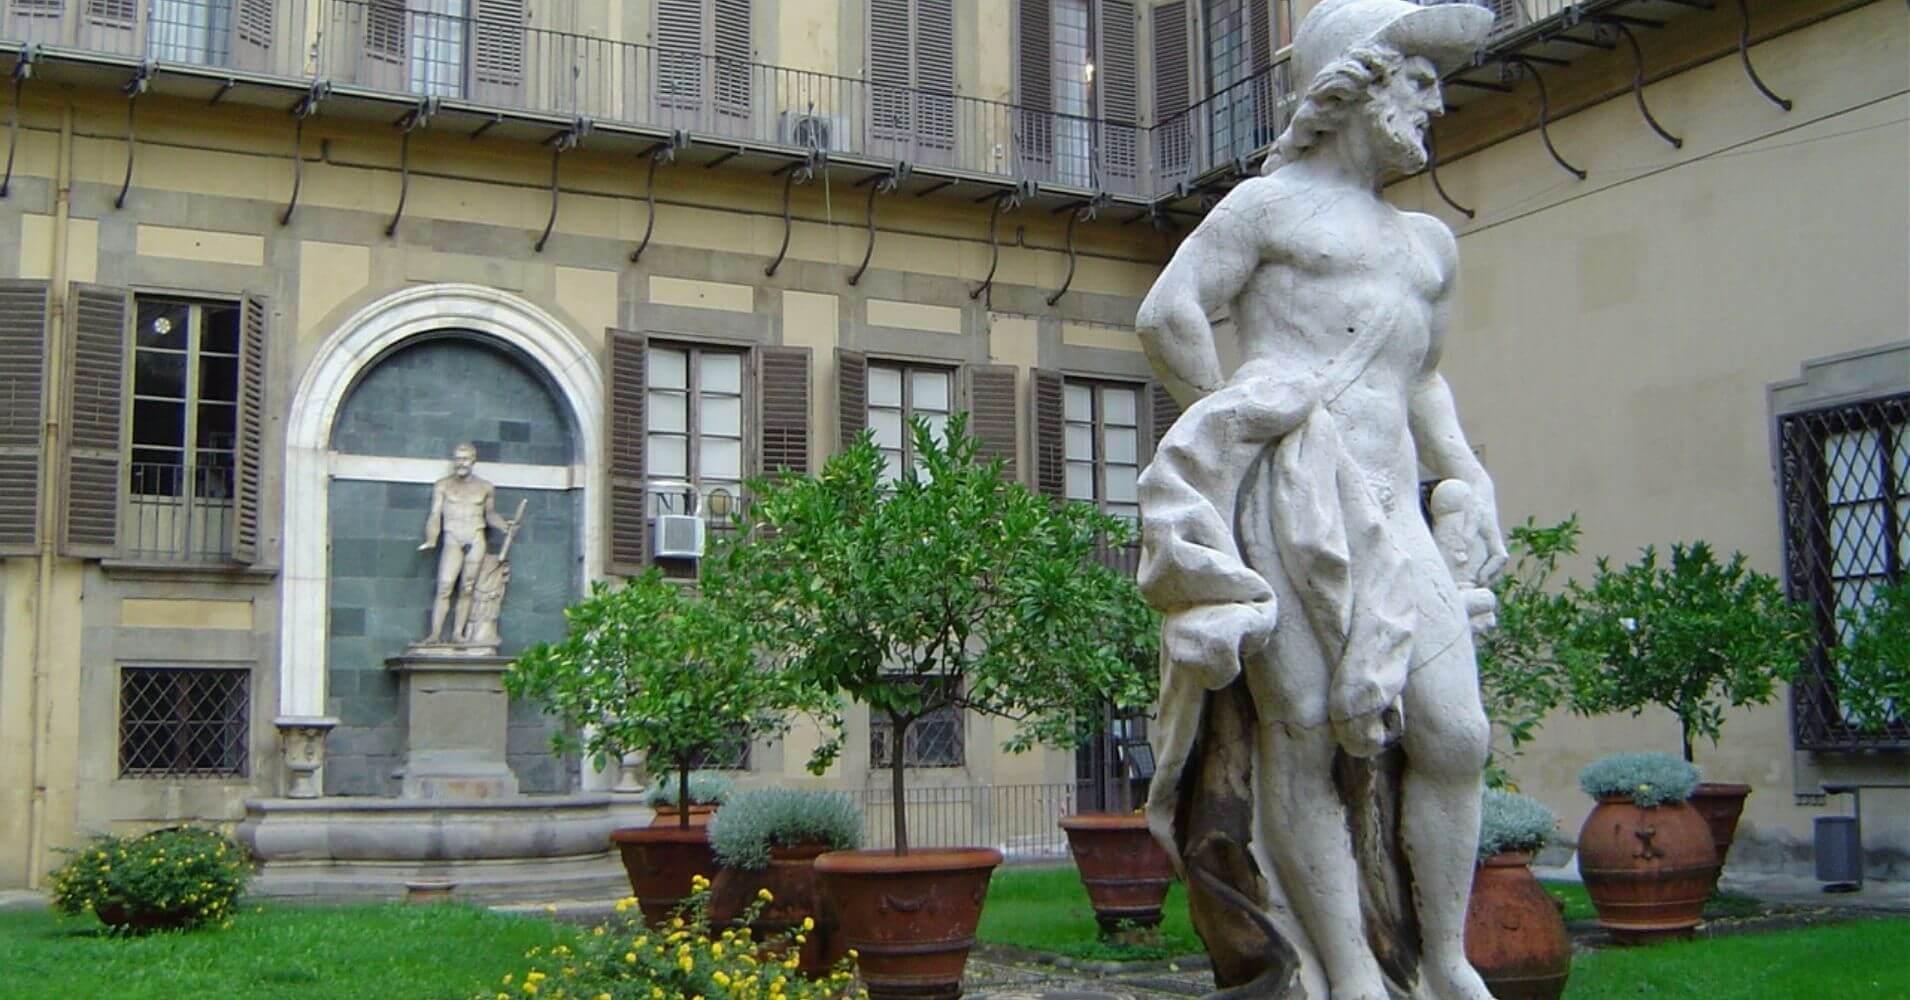 Jardín Palacio Medici Ricardi. Cinco días en Florencia. Toscana, Italia.